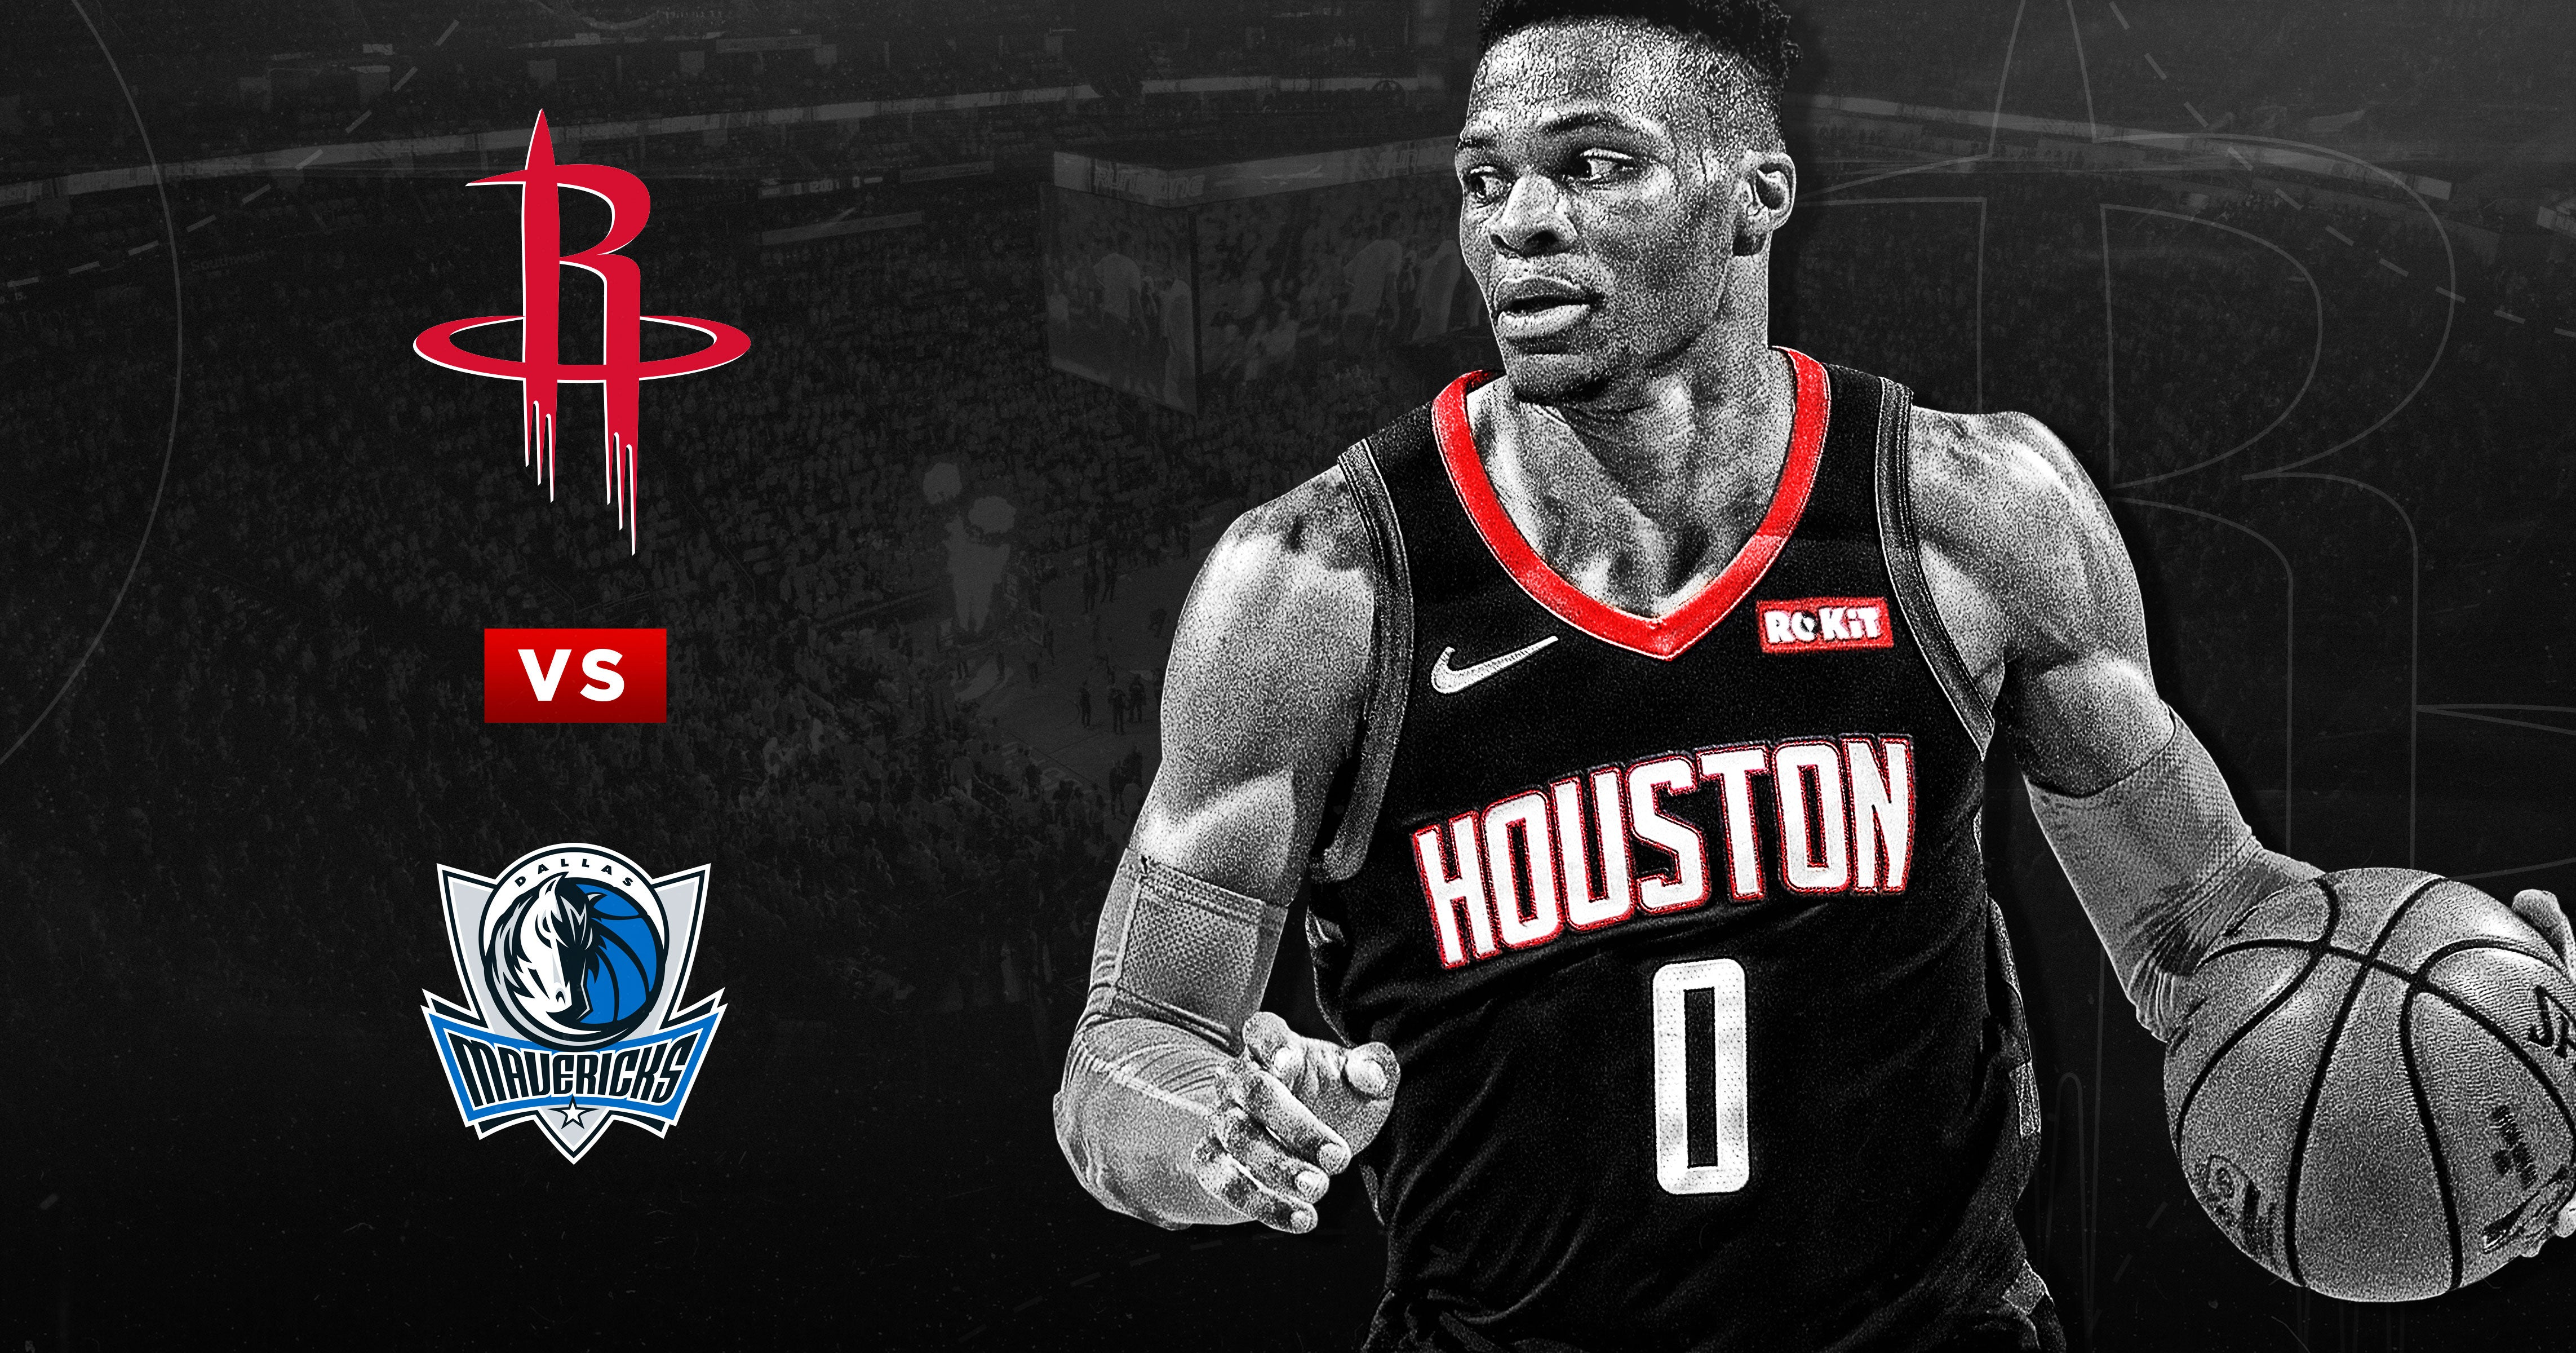 Houston Rockets vs. Dallas Mavericks | Houston Toyota Center